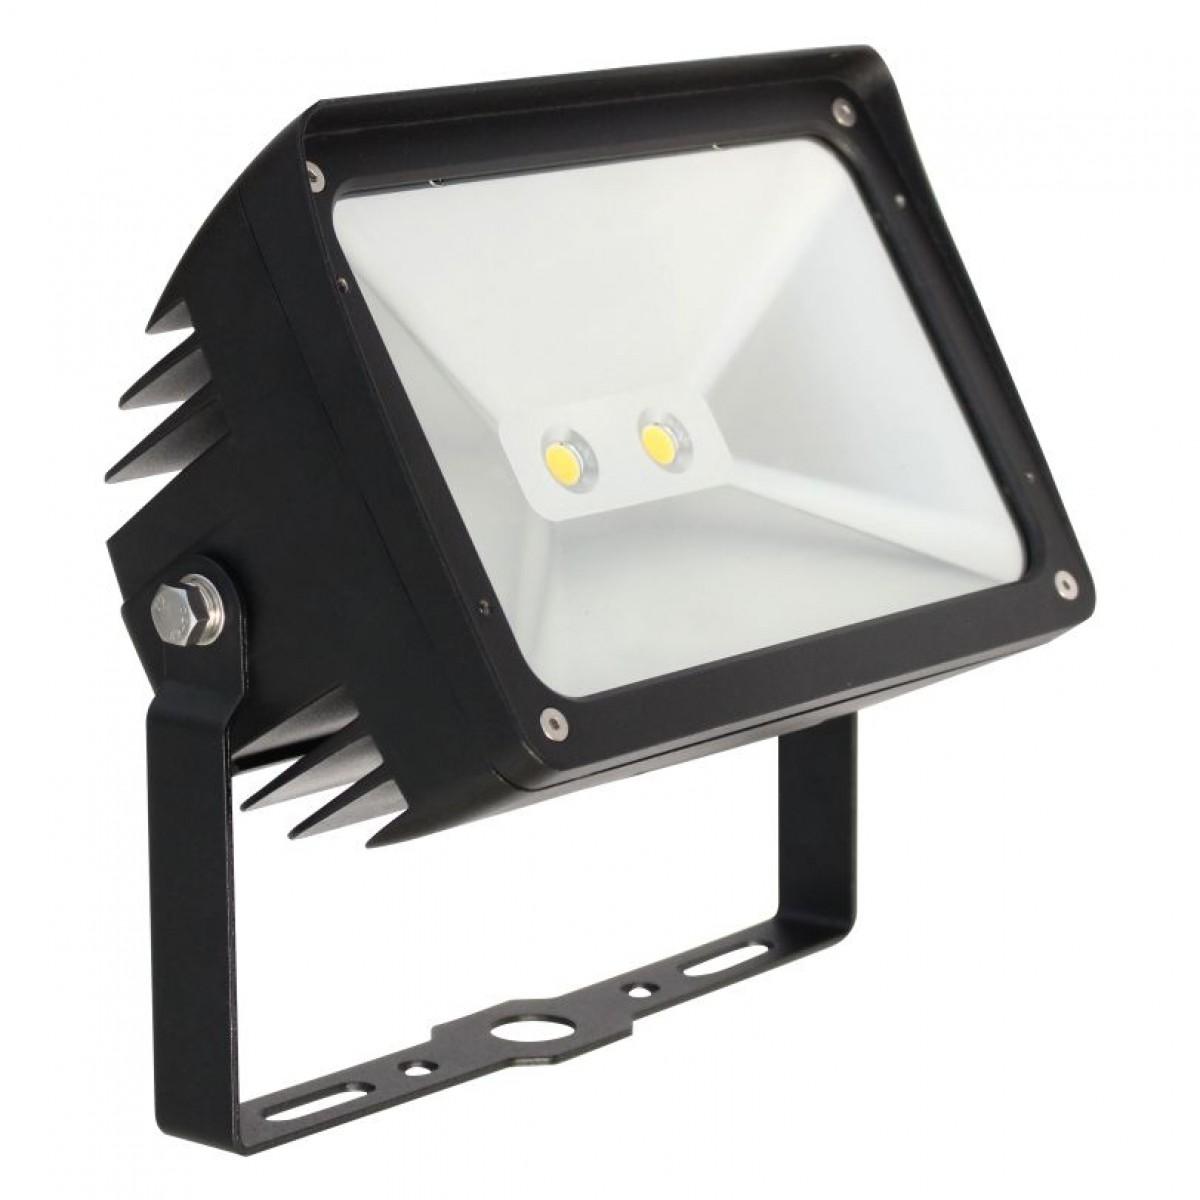 LFL3-30W-T  sc 1 st  Orbit Industries & LFL3 Trunnion Mount - LED Flood Lighting - LED Lighting